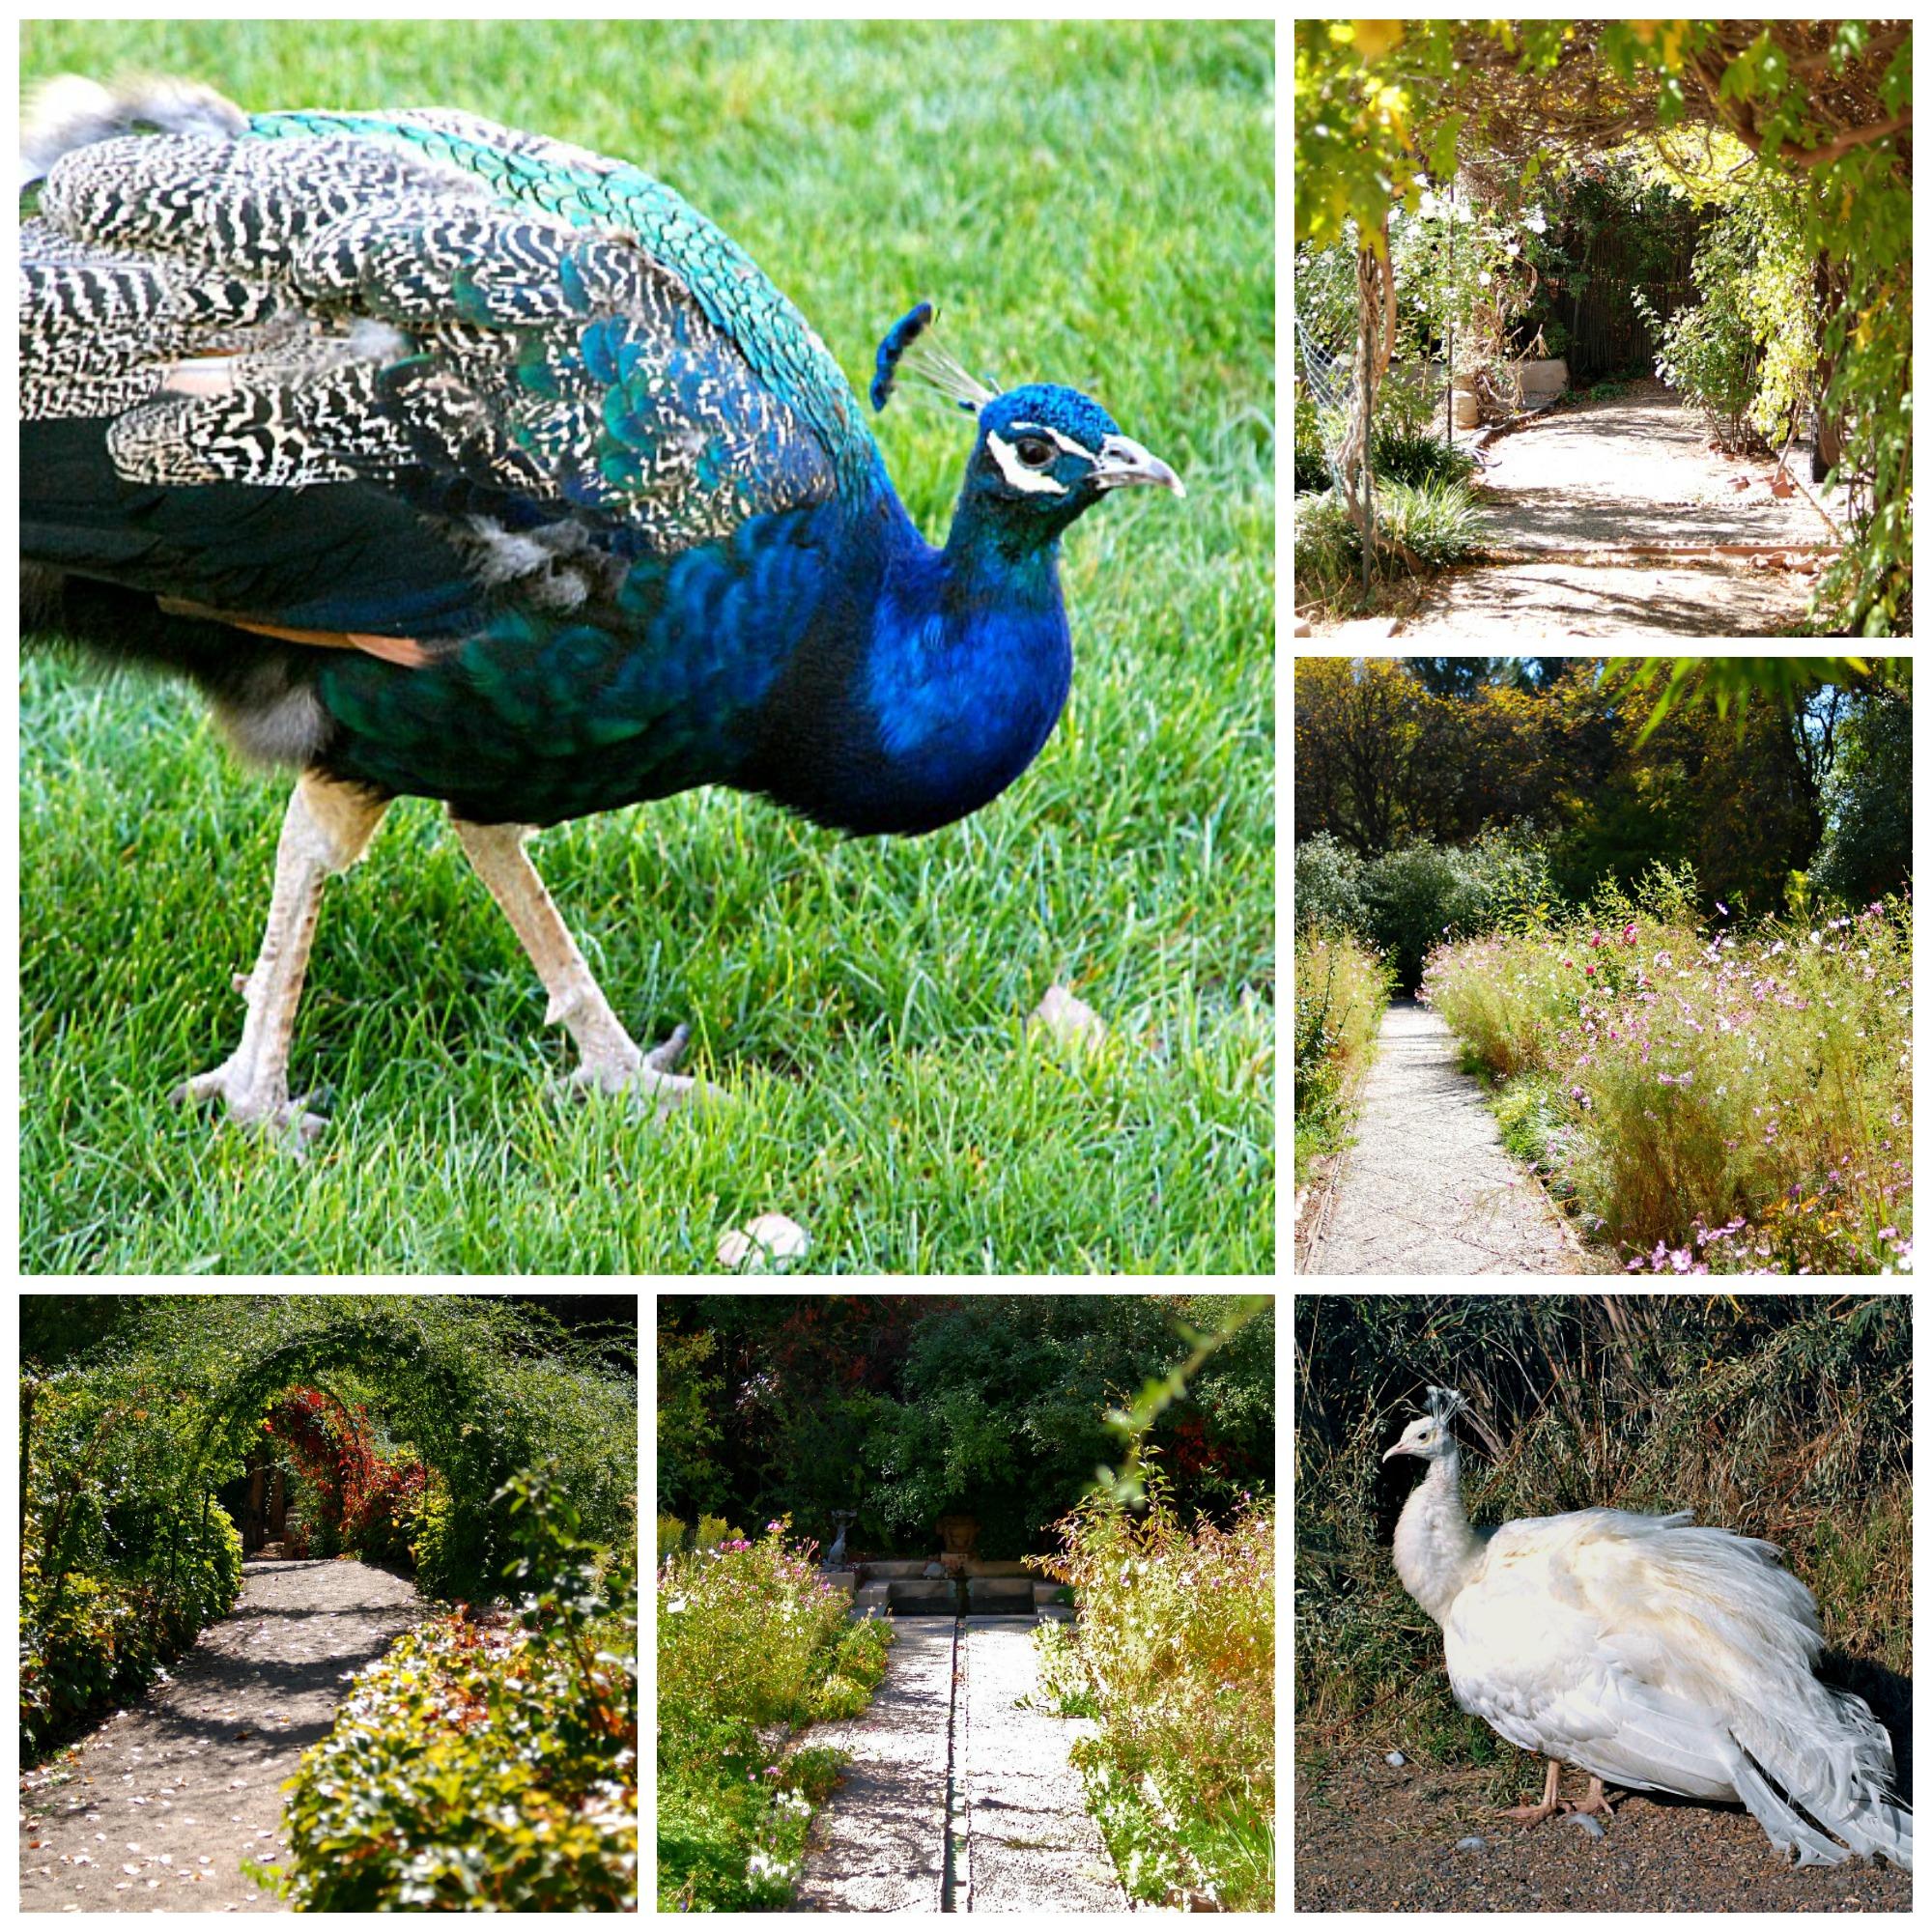 Paths and Peacocks